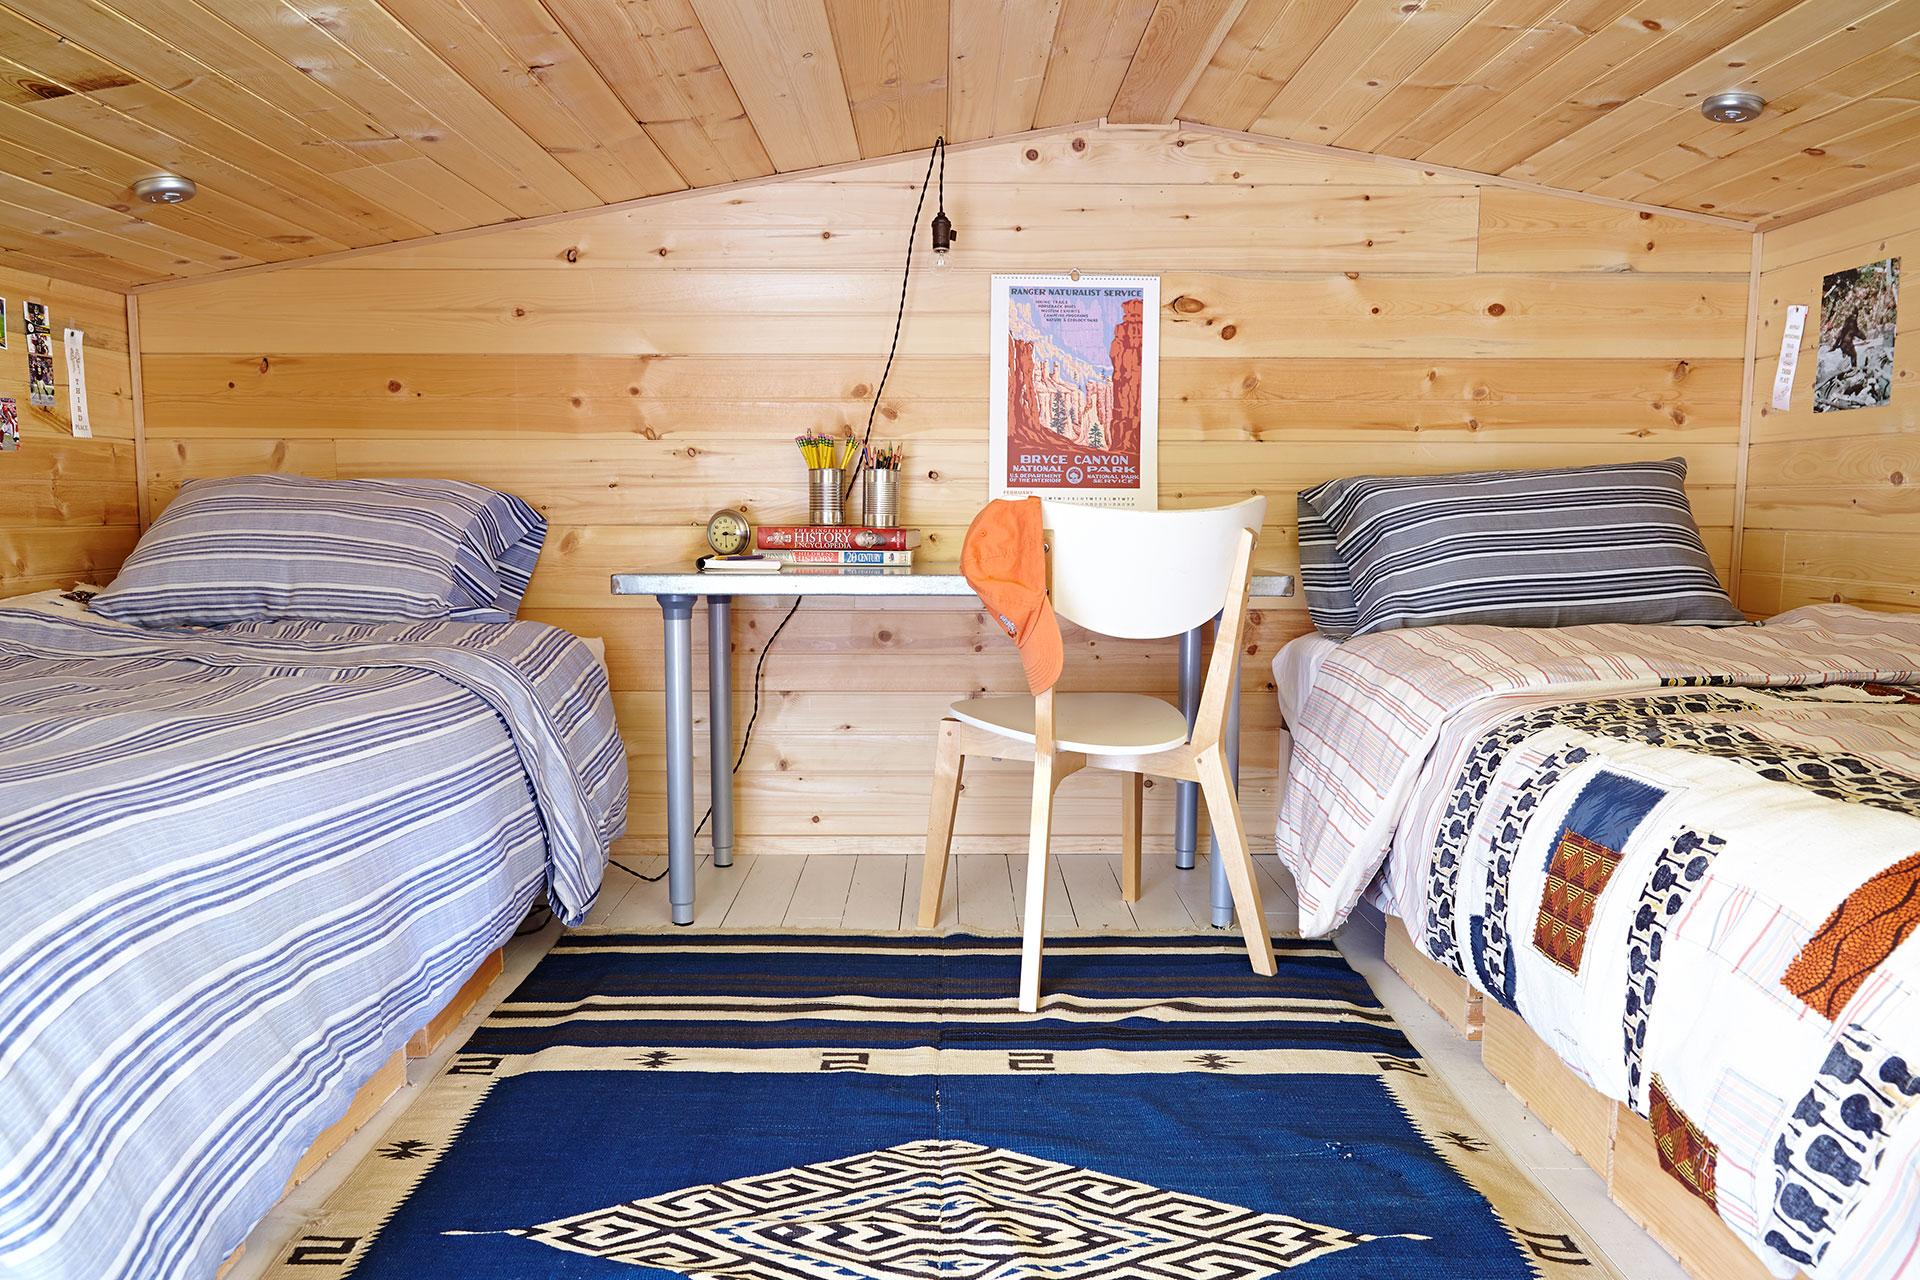 Carmella McCafferty DIY Home Decor - DIY Home Decorating Ideas